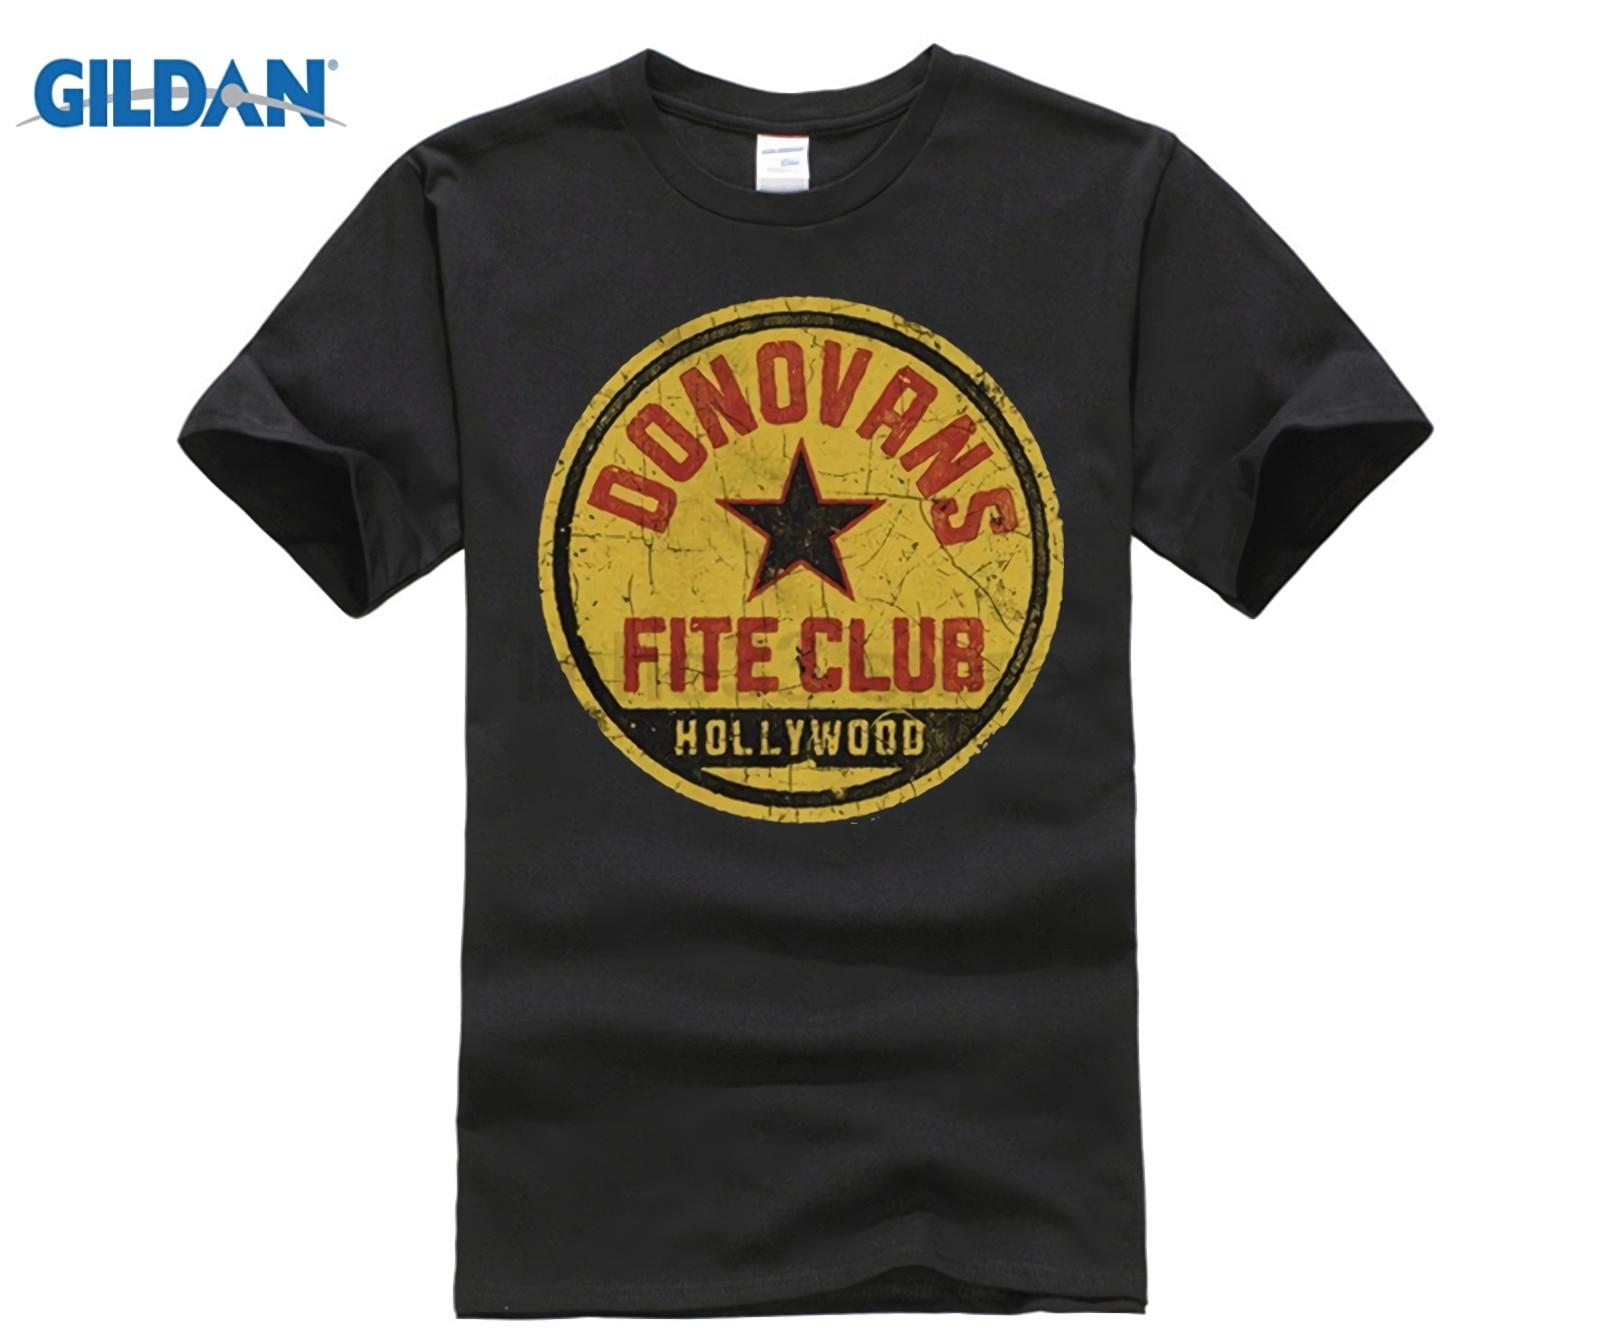 Pantalón corto Casual de manga corta Camiseta Ray Donovan Fite Club adulto Slim Fit camiseta 016086